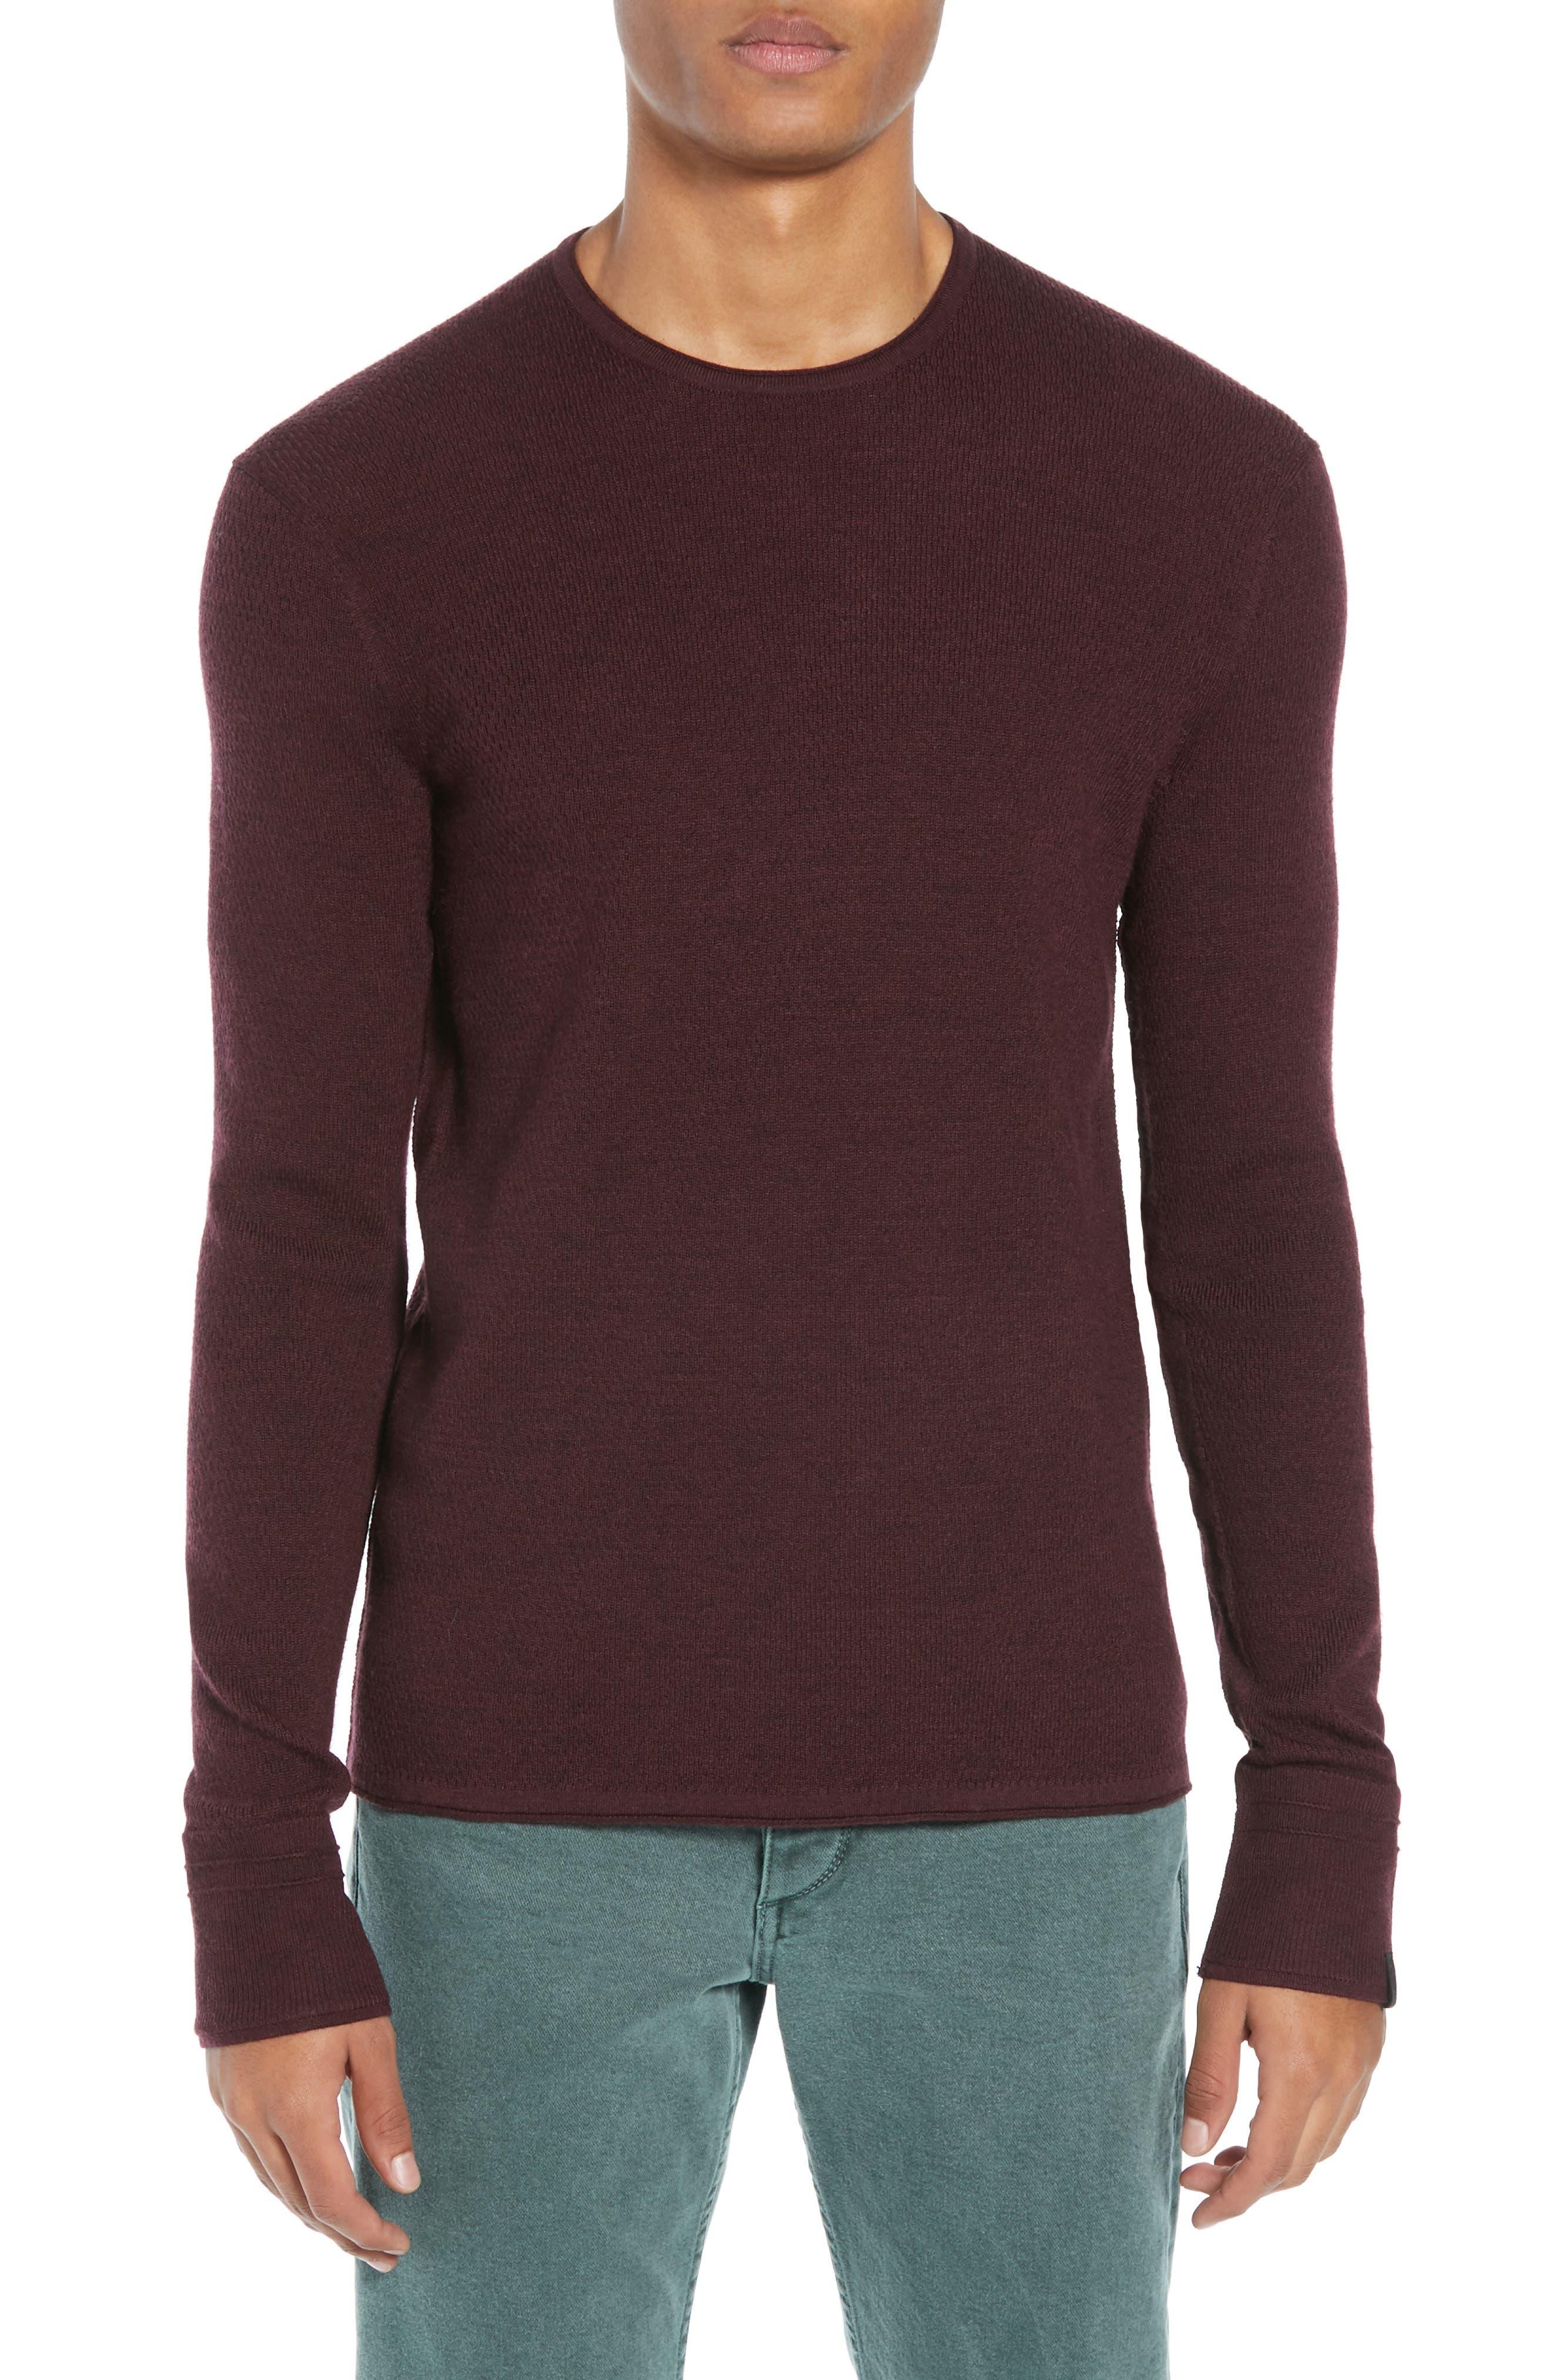 Gregory Merino Wool Blend Crewneck Sweater,                             Main thumbnail 1, color,                             BURGUNDY